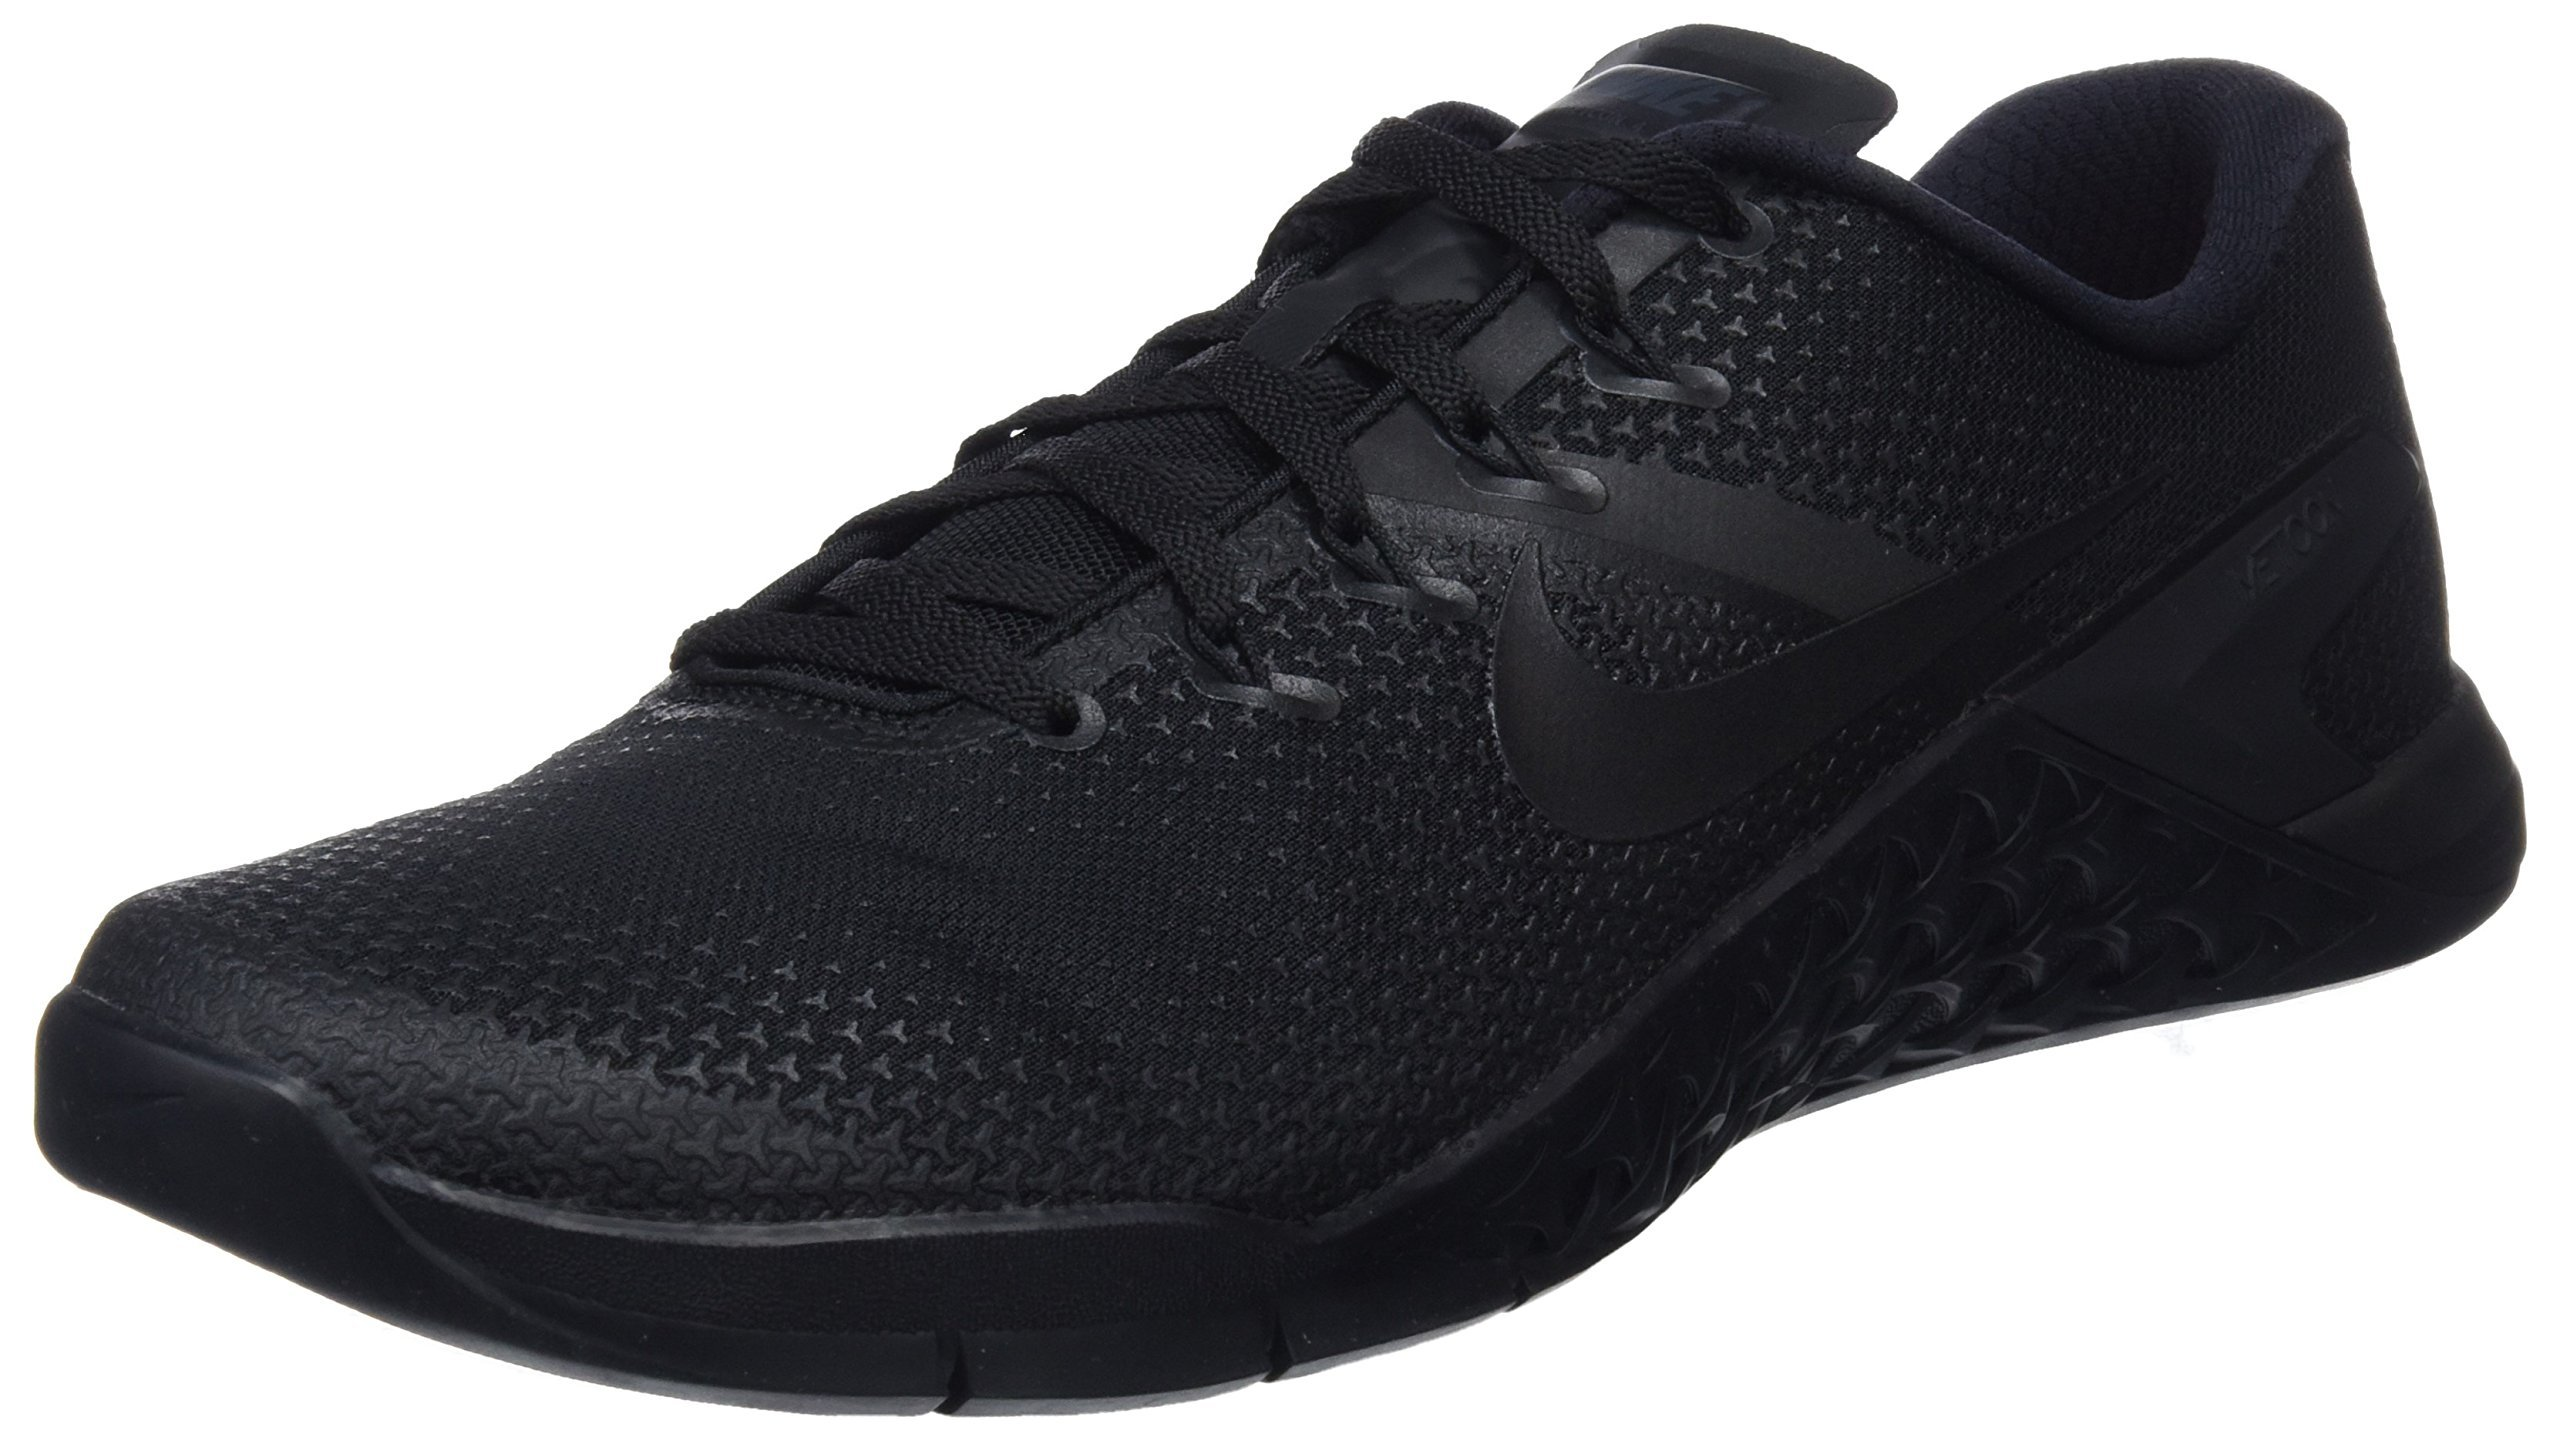 Nike Metcon 4 Premium Mens Cross Training Shoes (7.5)